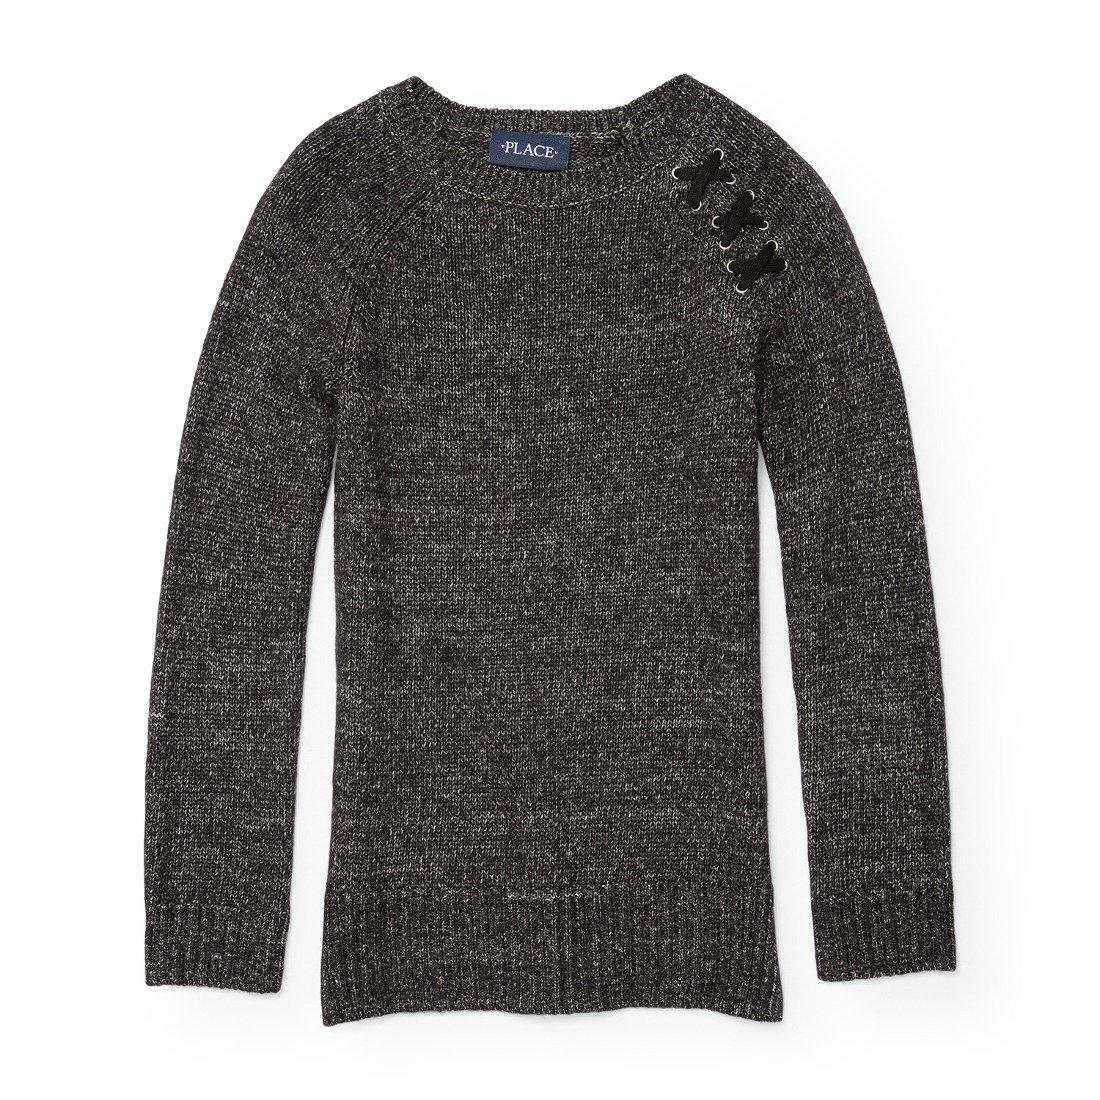 The Children's Place Big Girls' Sweater, Black 88077, XS (4)